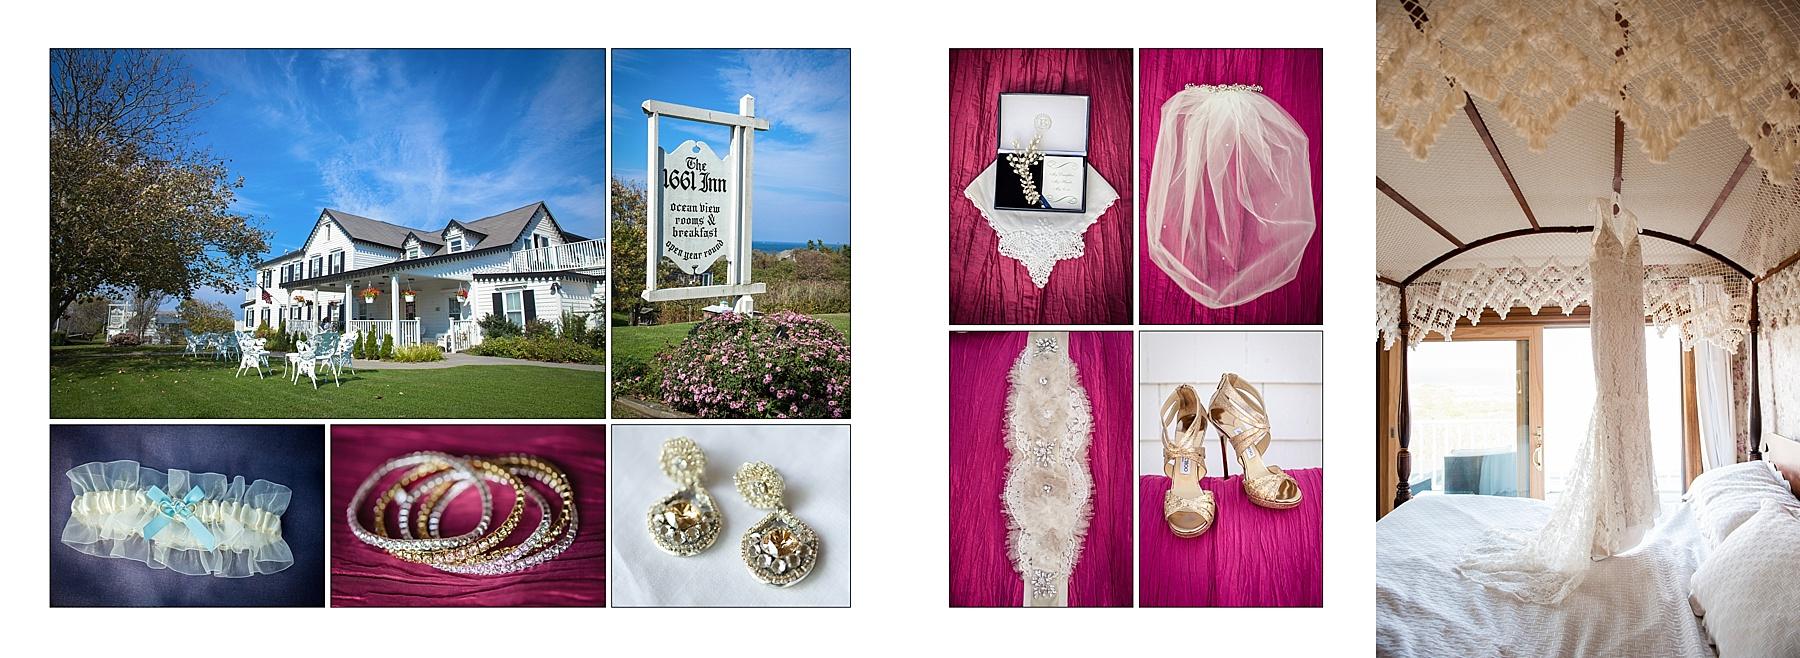 spread02_Wedding Album_Block Island RI WEB.jpg